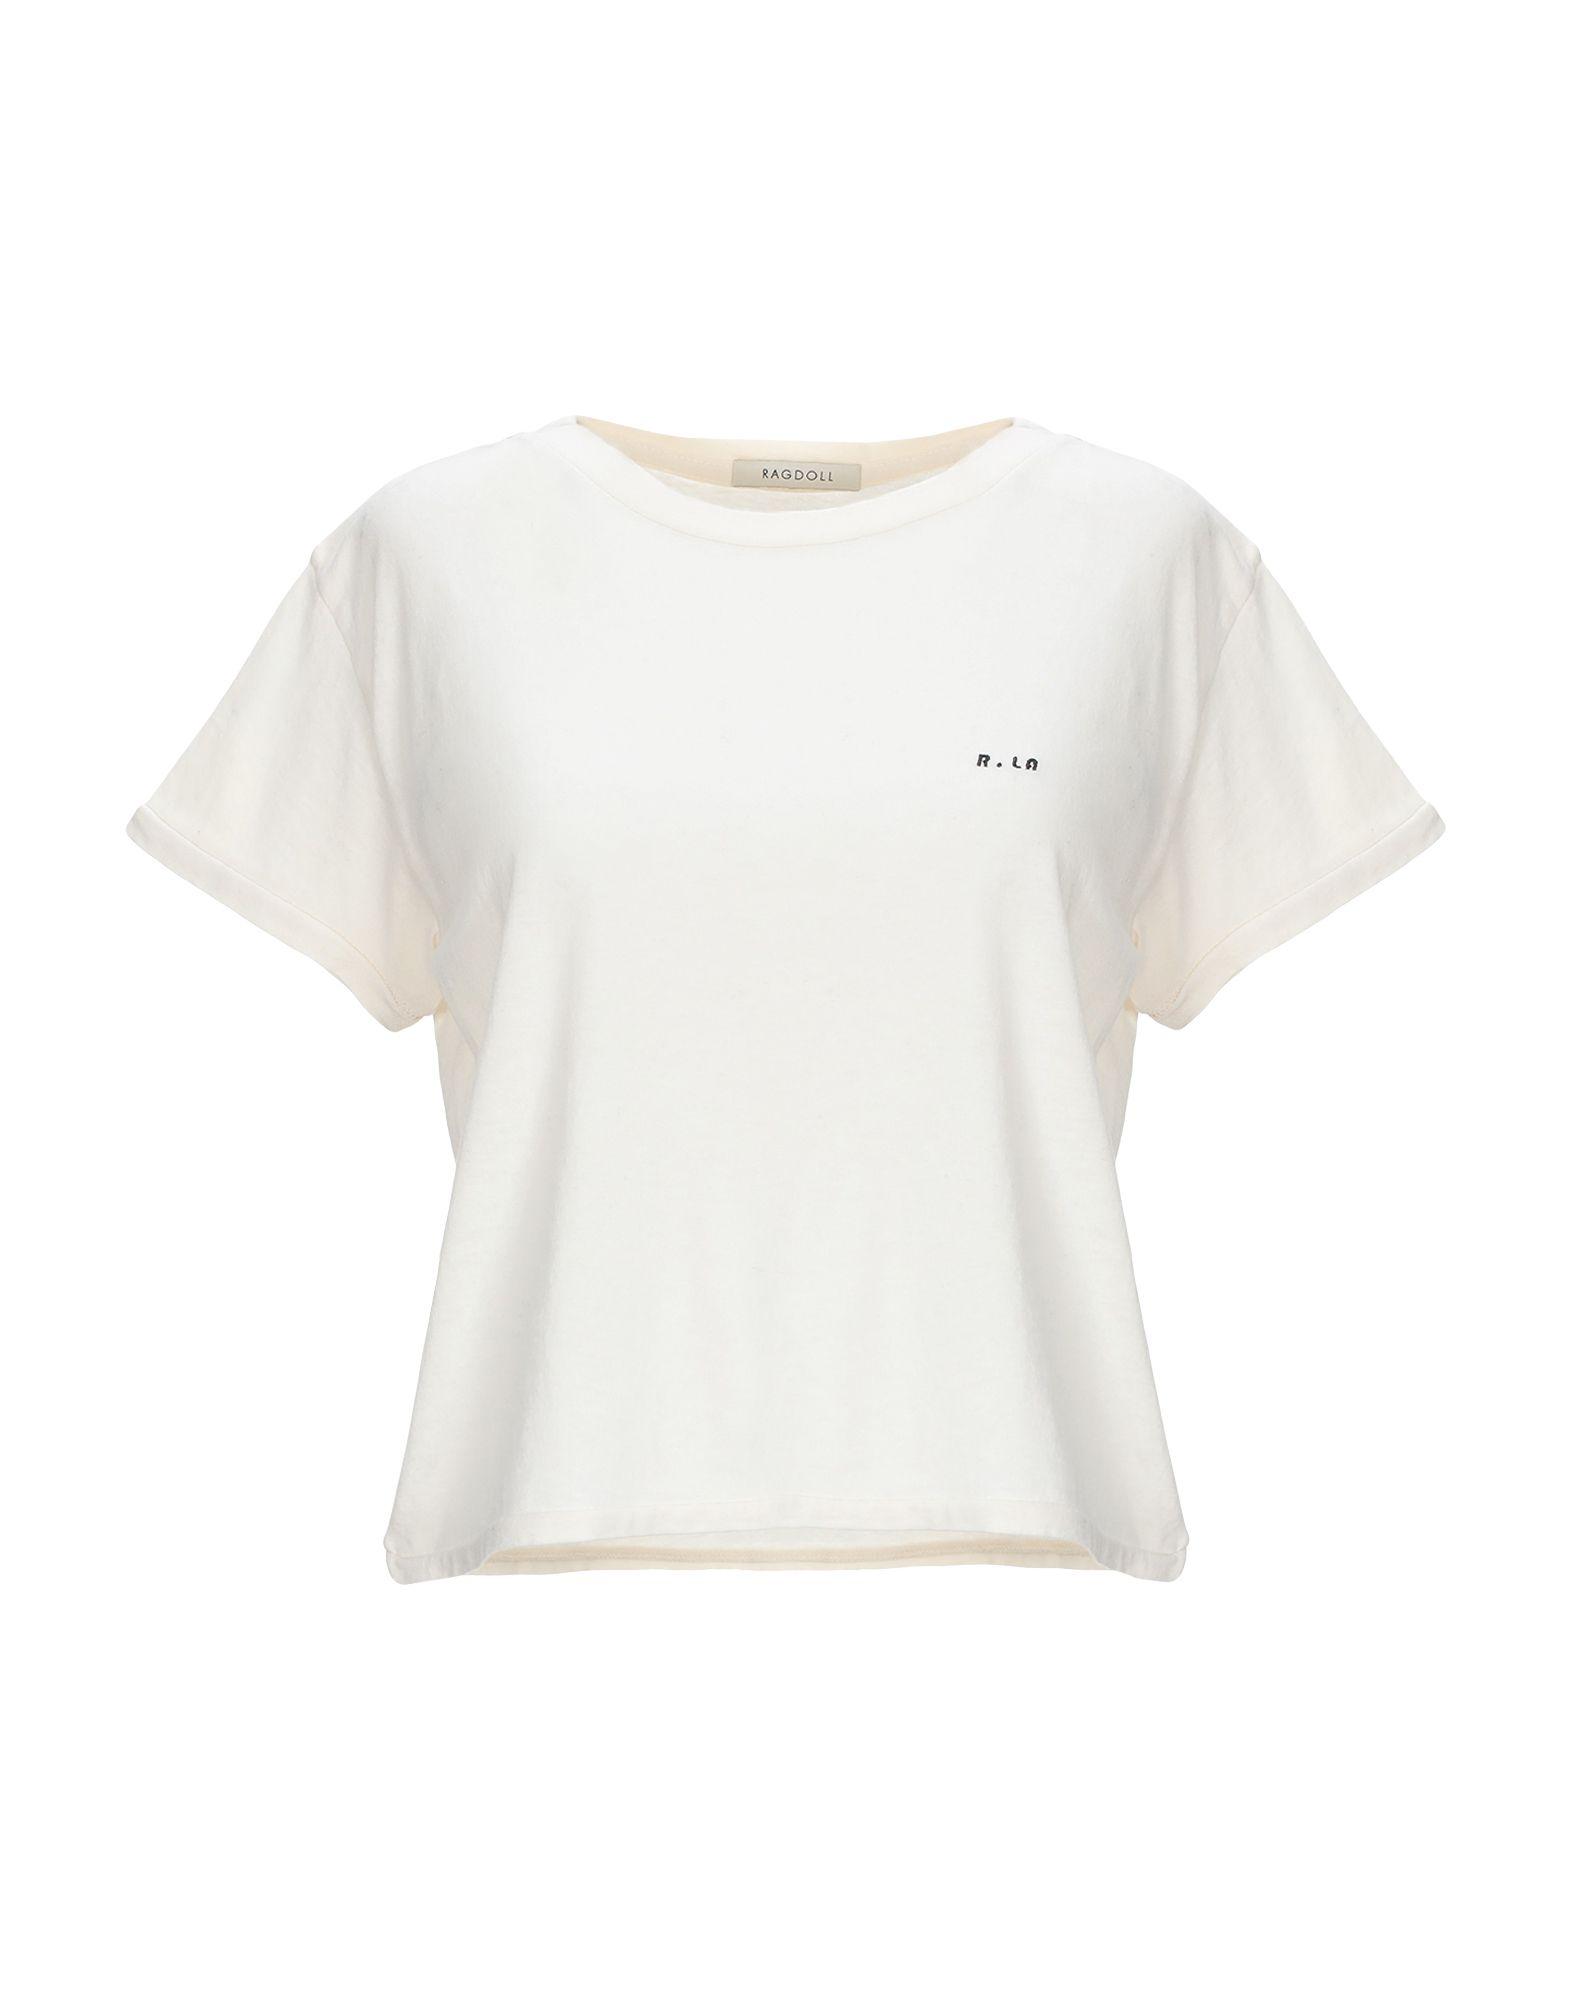 T-Shirt T-Shirt Ragdoll donna - 12334717FE